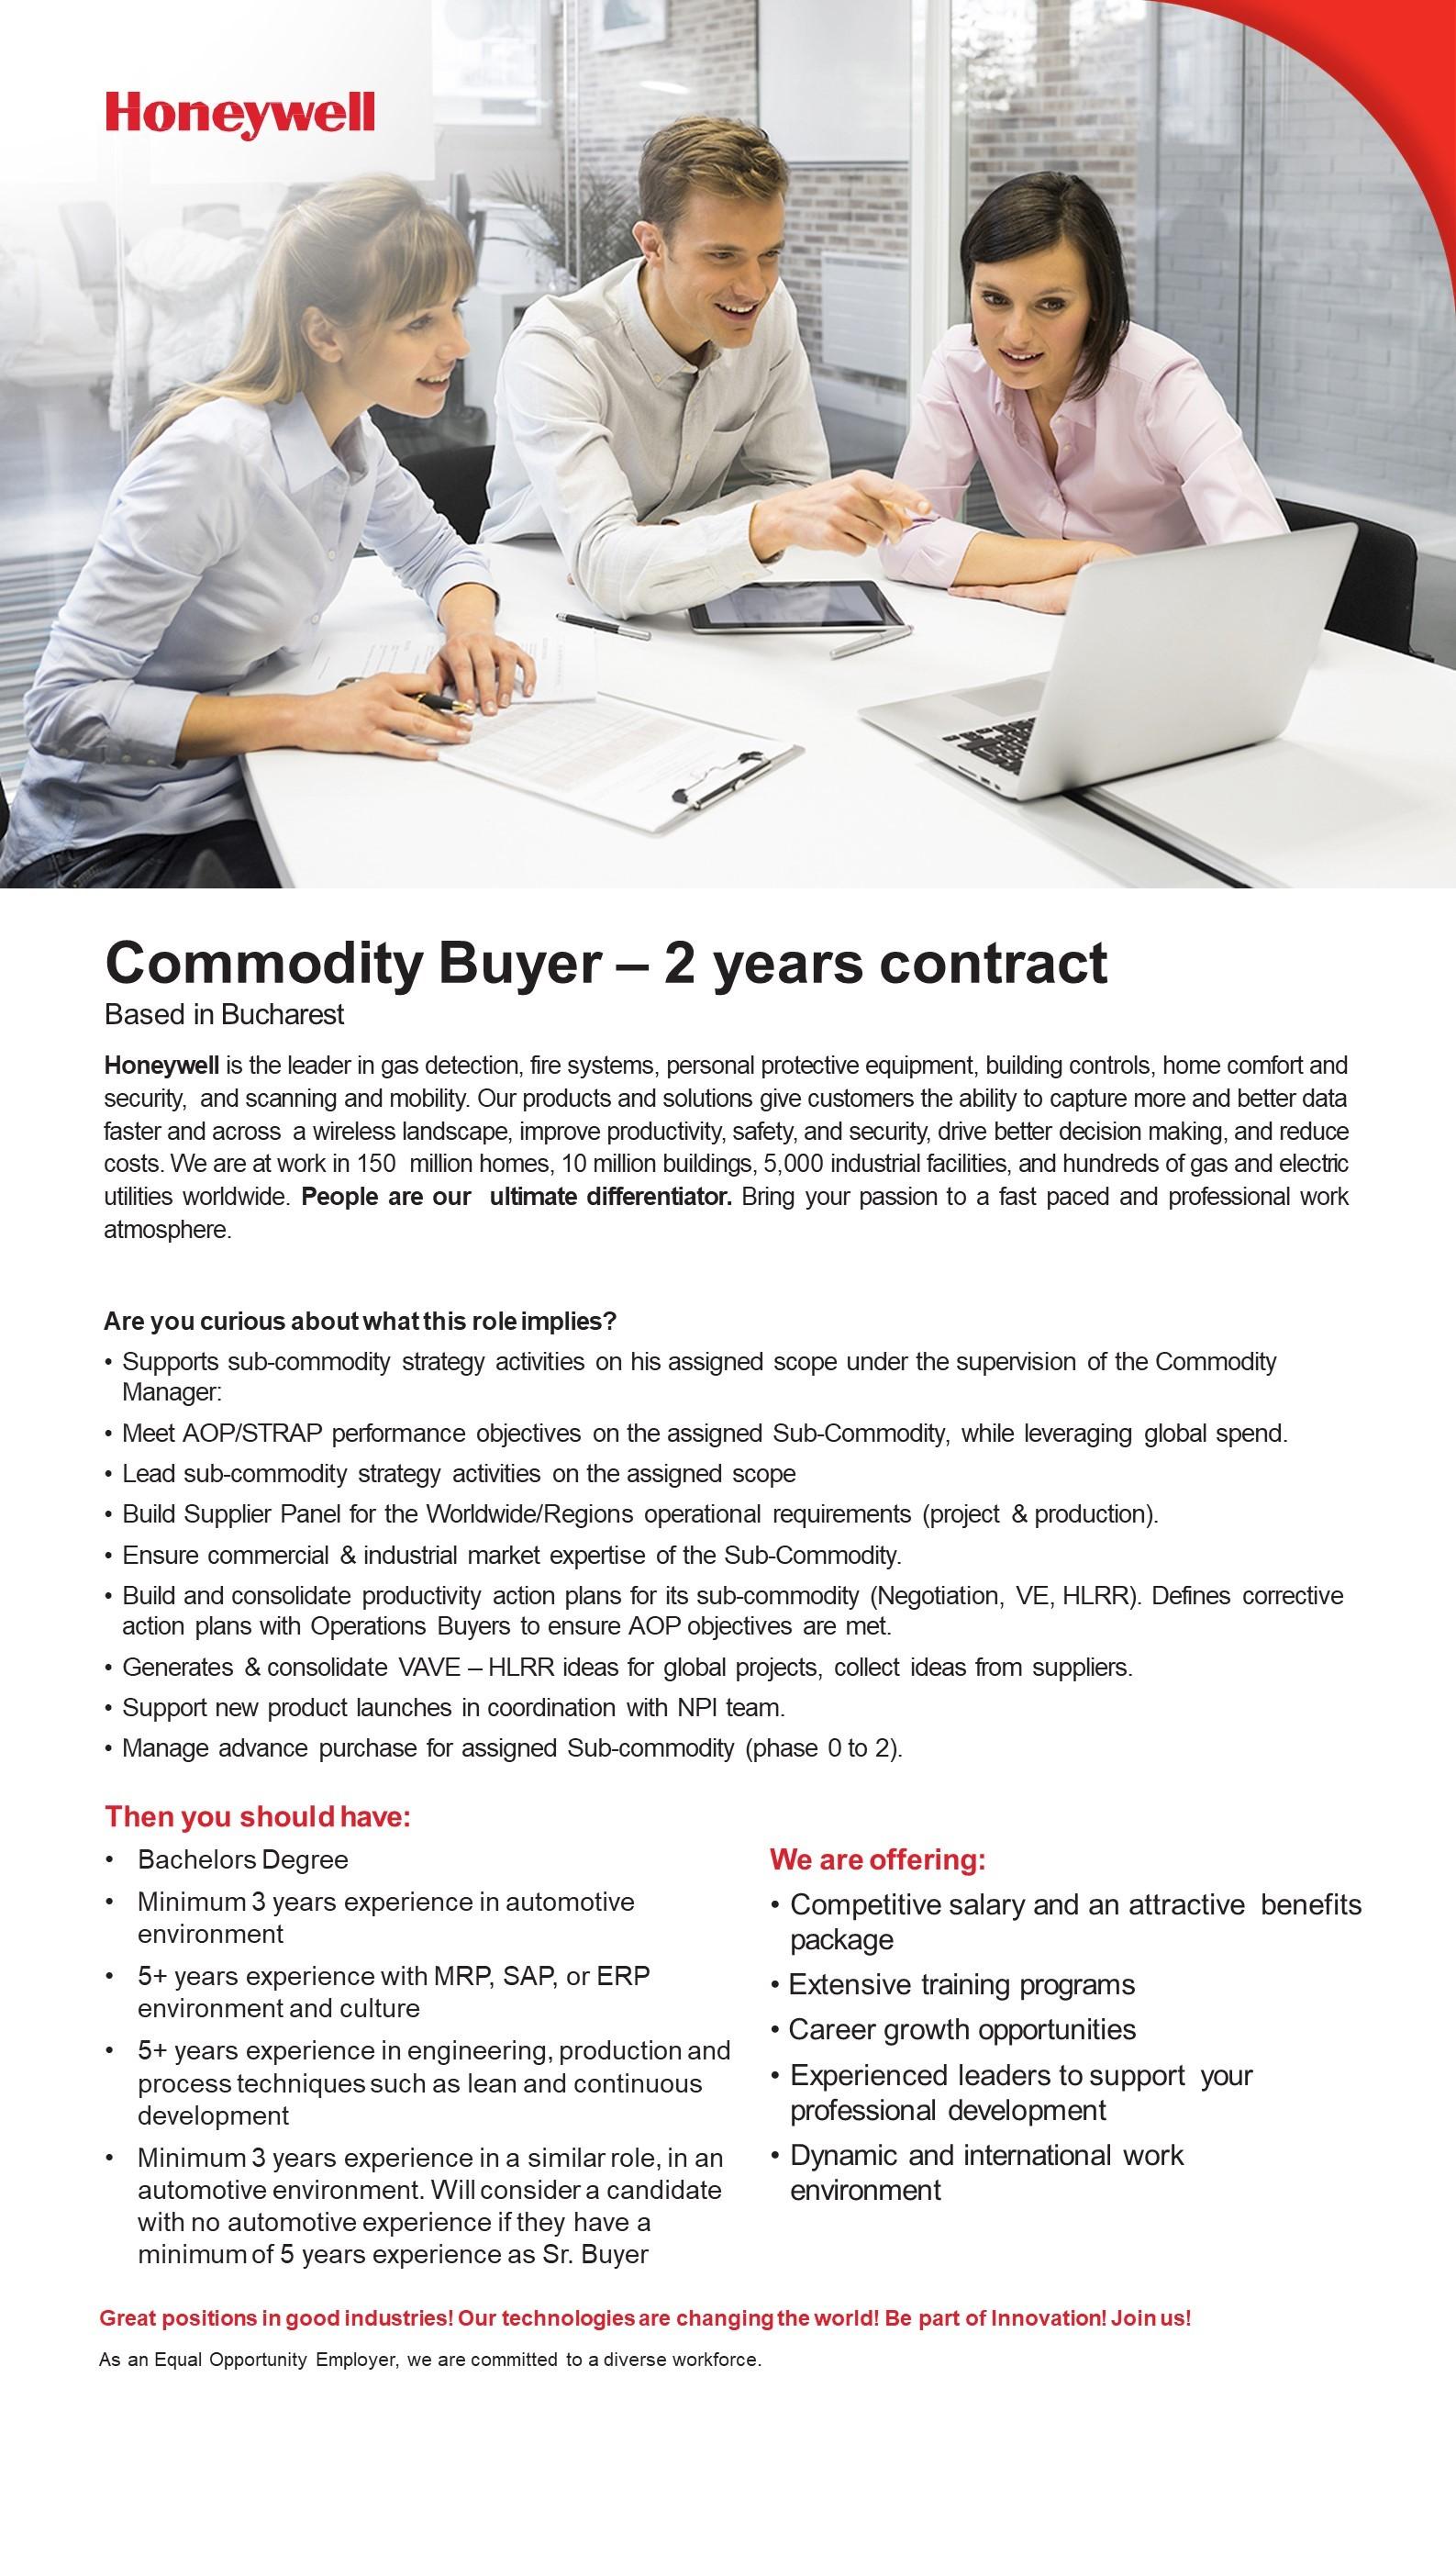 Commodity buyer 2 years contract